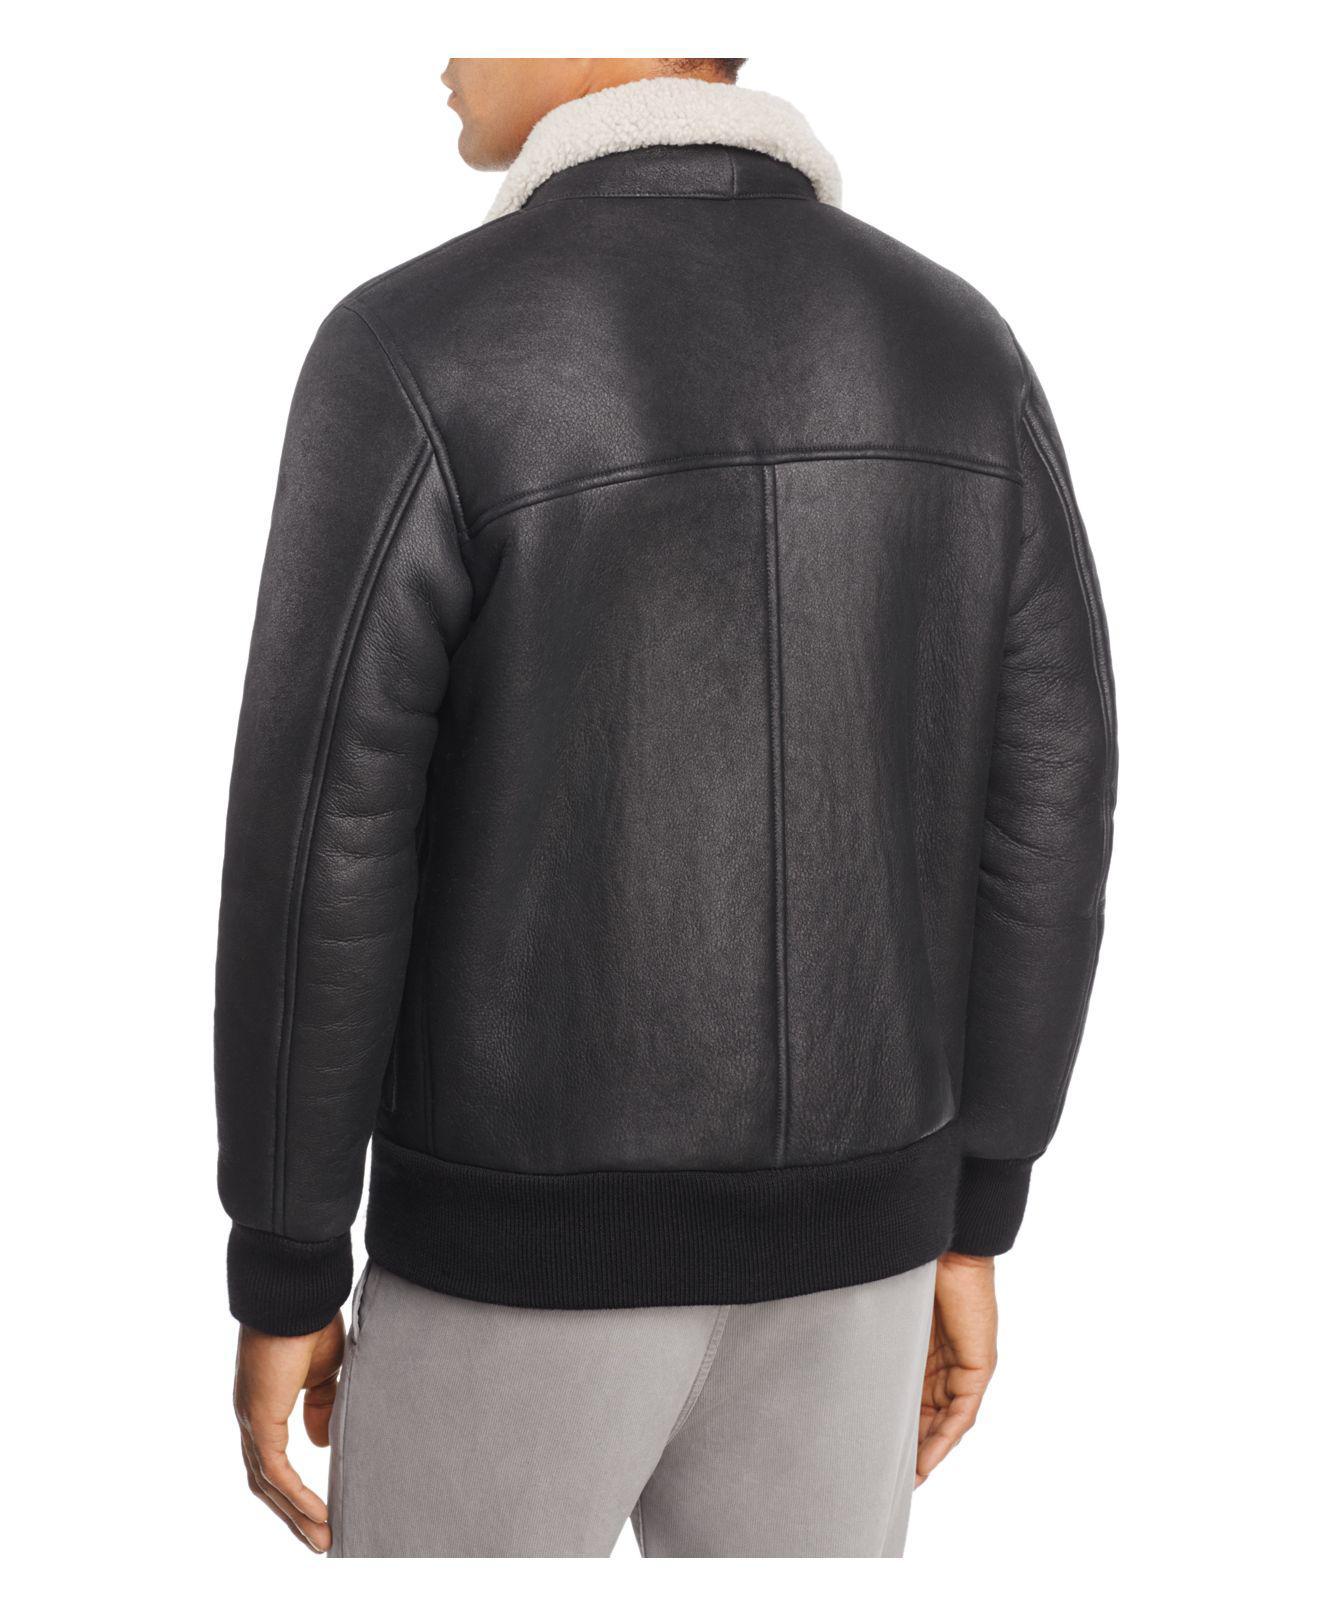 Eidos Cain Shearling Flight Jacket in Black for Men